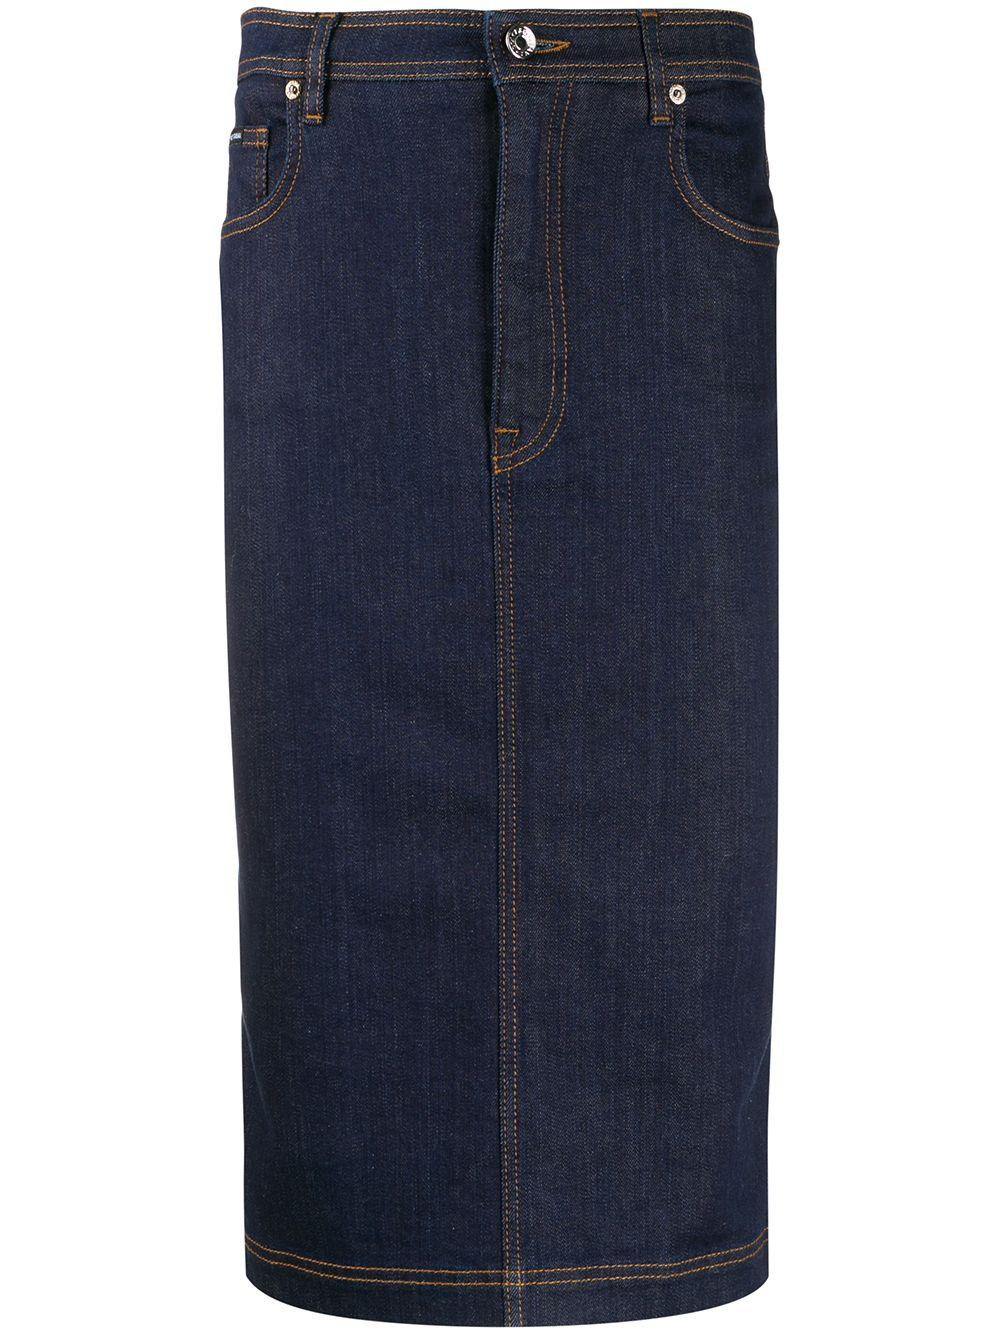 Dolce & Gabbana джинсовая юбка-карандаш